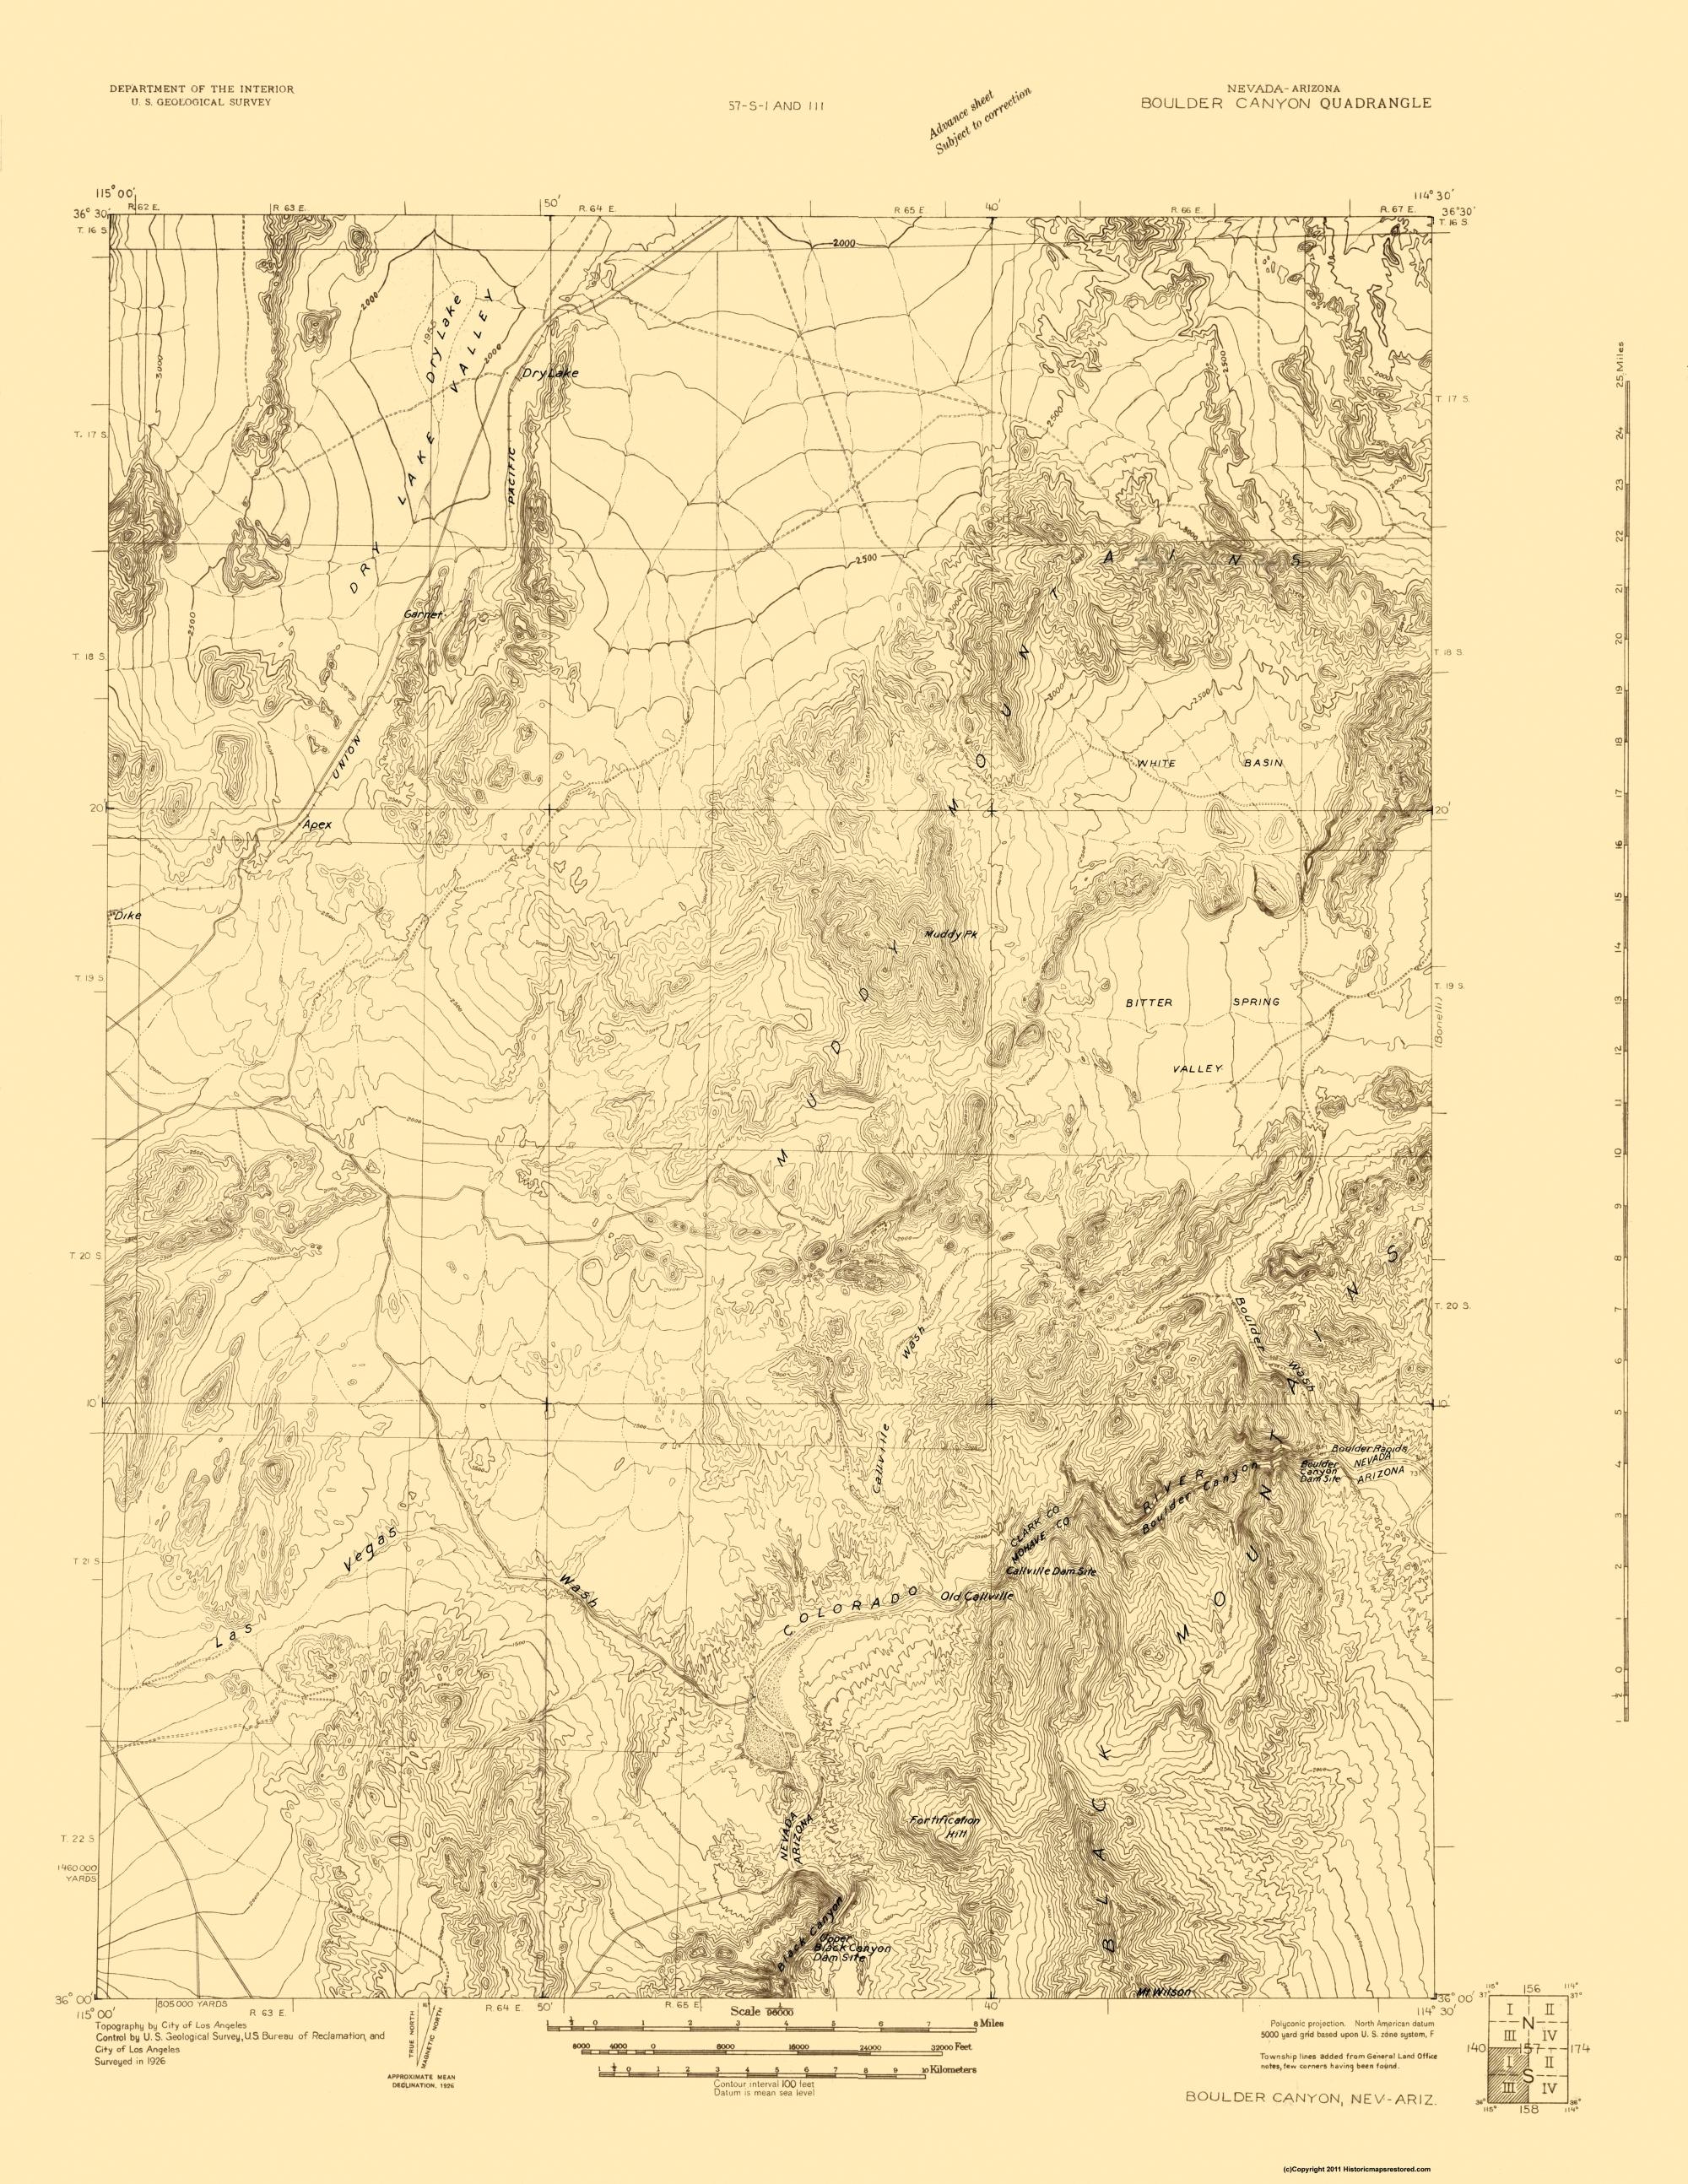 Map Of Nevada And Arizona.Topographical Map Boulder Canyon Nevada Arizona Quad Usgs 1926 17 X 22